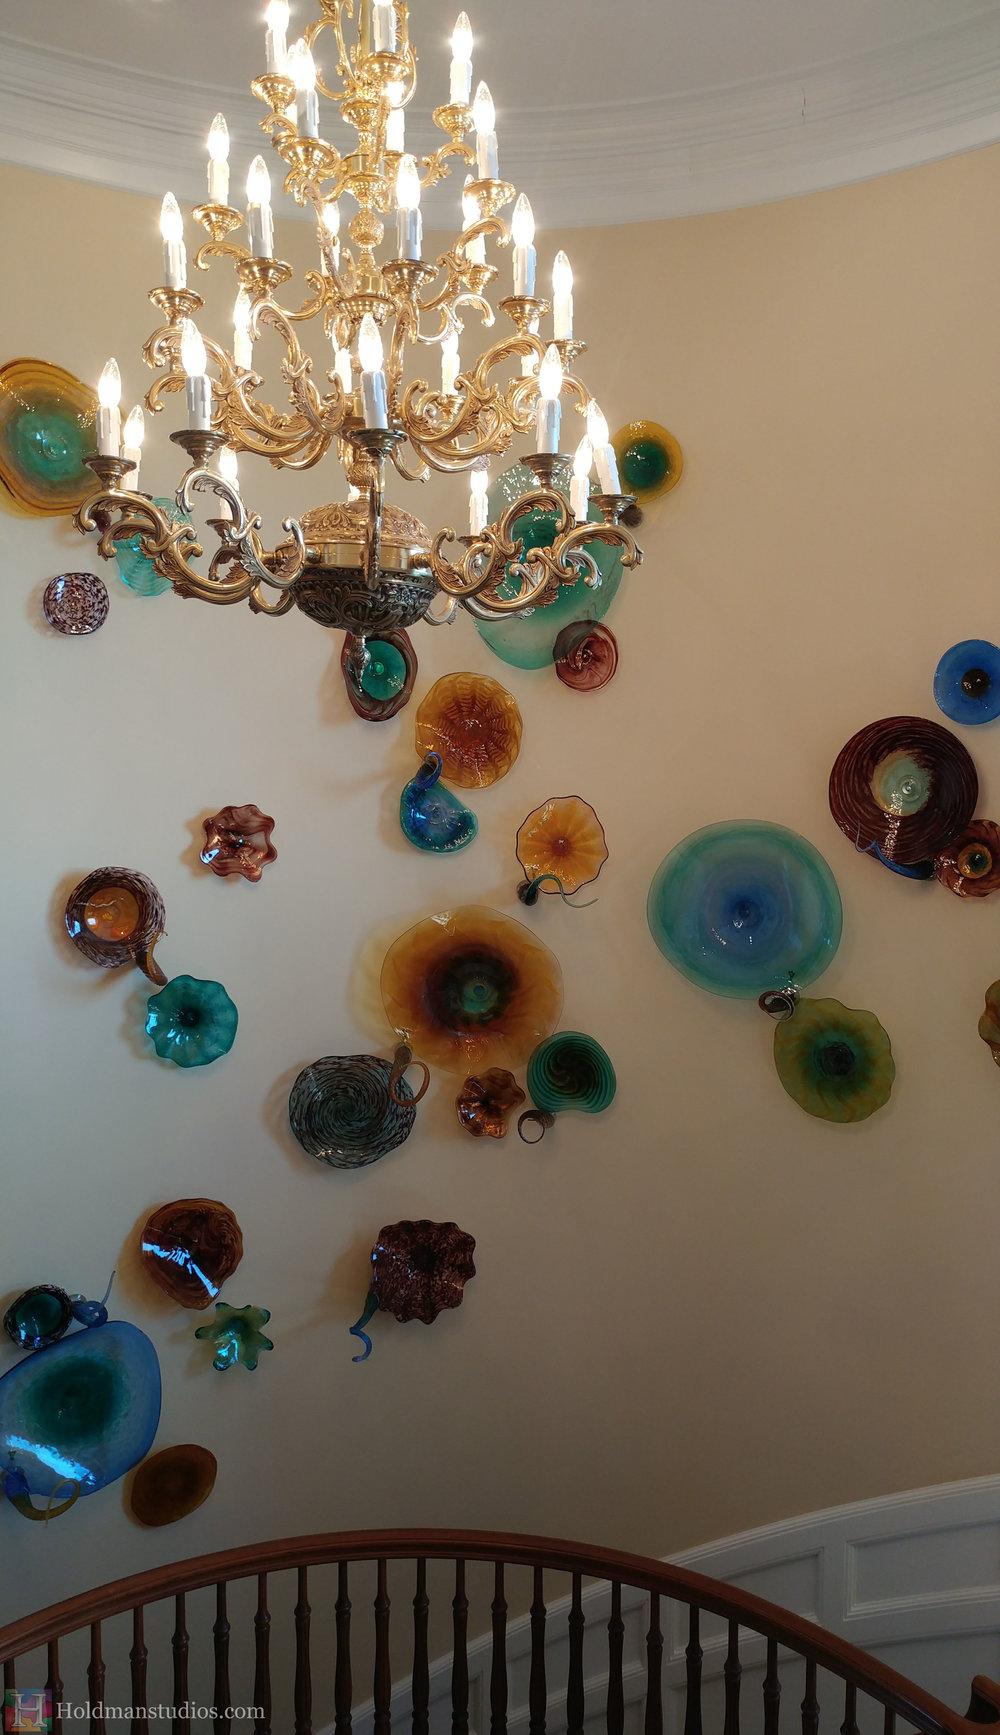 holdman-studios-hand-blown-glass-platters-bowls-tendrils-stair-wall-display-closeup2.jpg